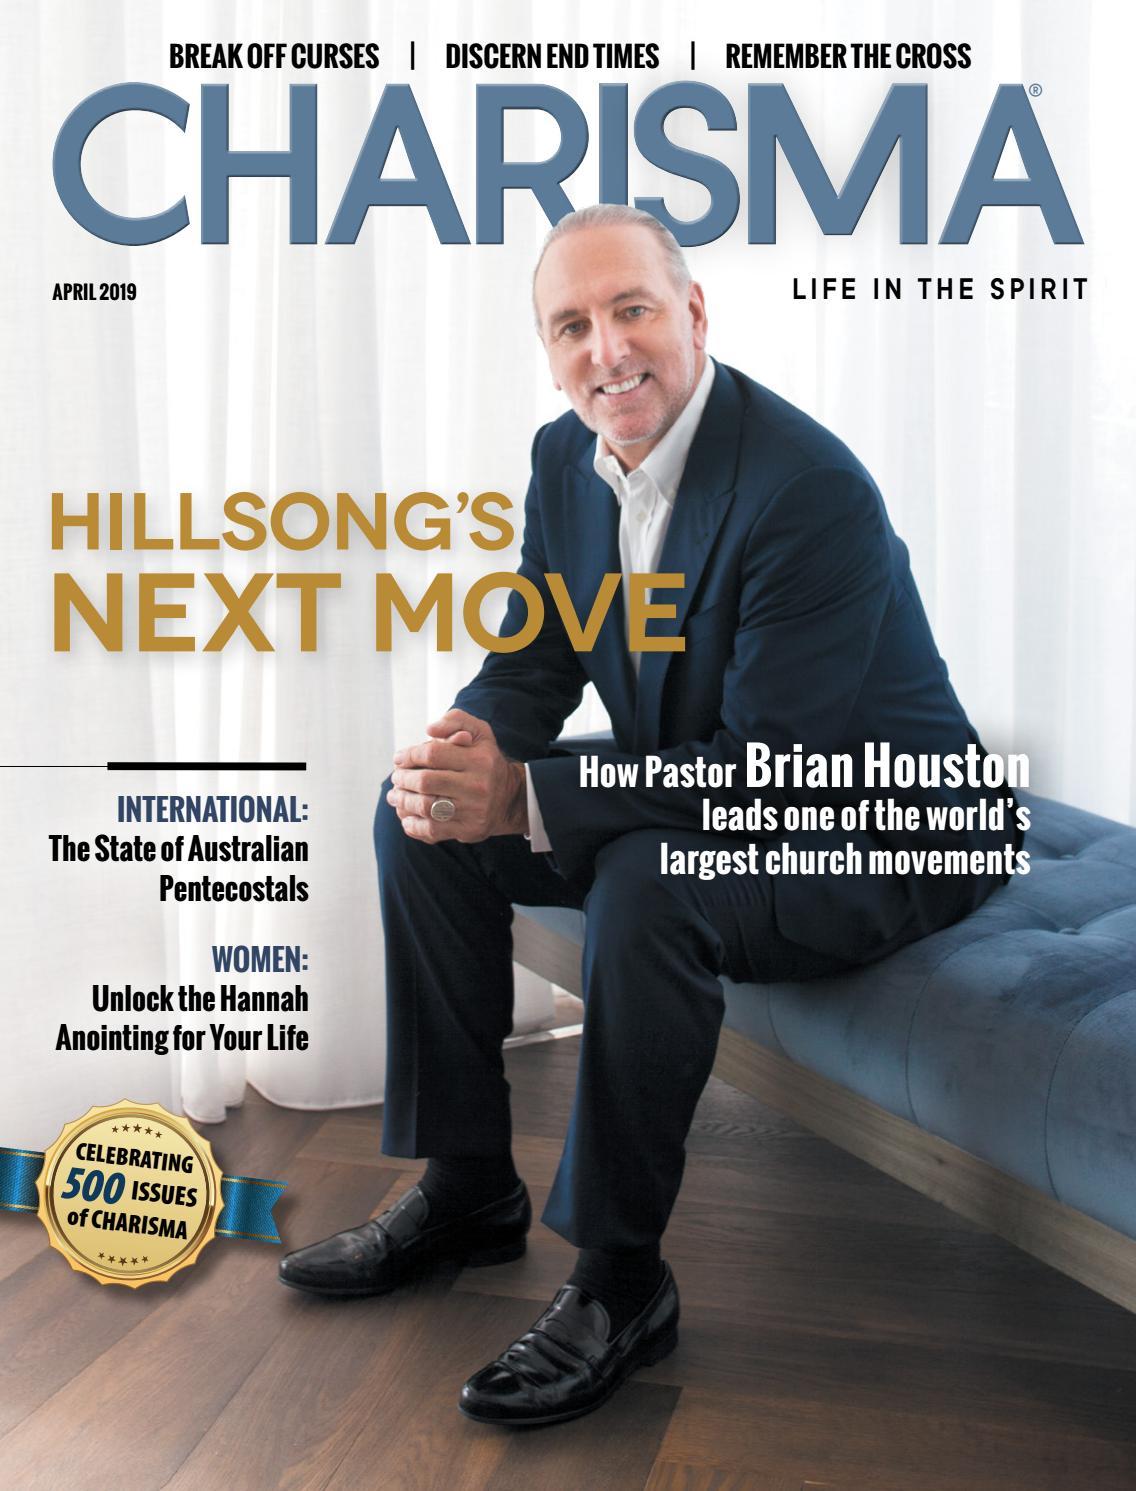 Charisma Magazine - April 2019 by Charisma Media - issuu